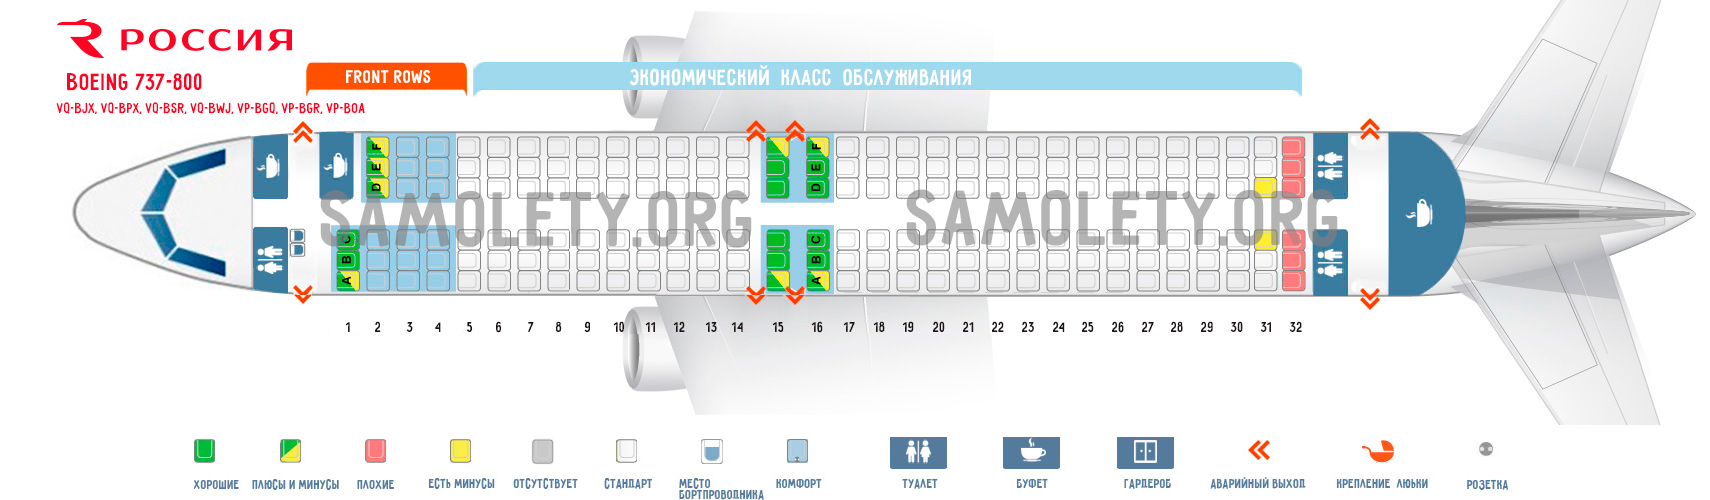 Боинг 738 схема салона авиакомпания россия